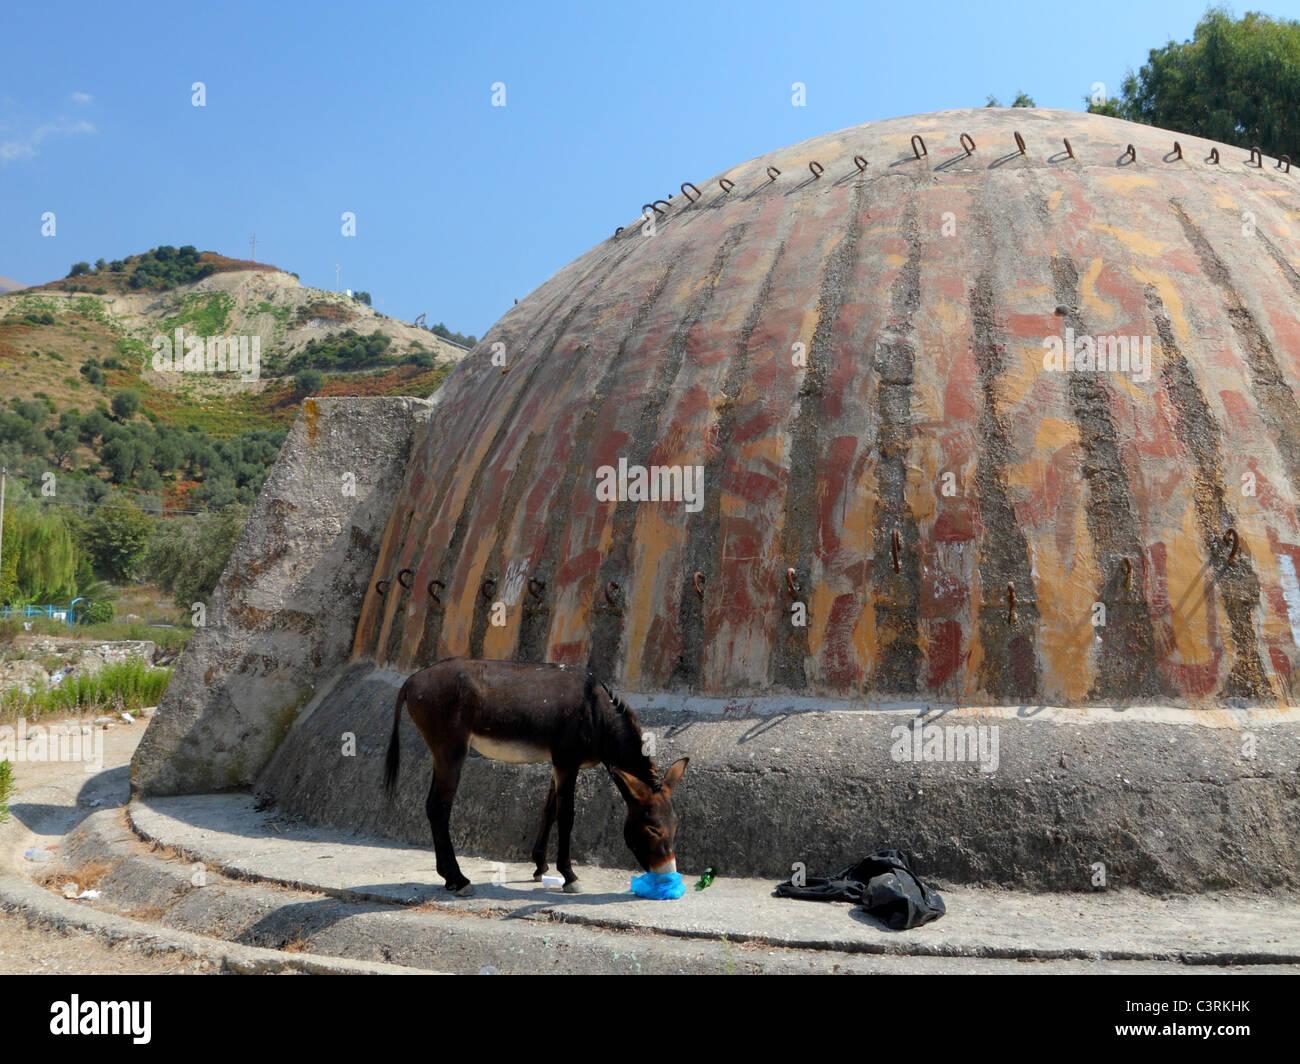 stray donkey feeding on garbage besides huge heavy bunker cone in Albania - Stock Image